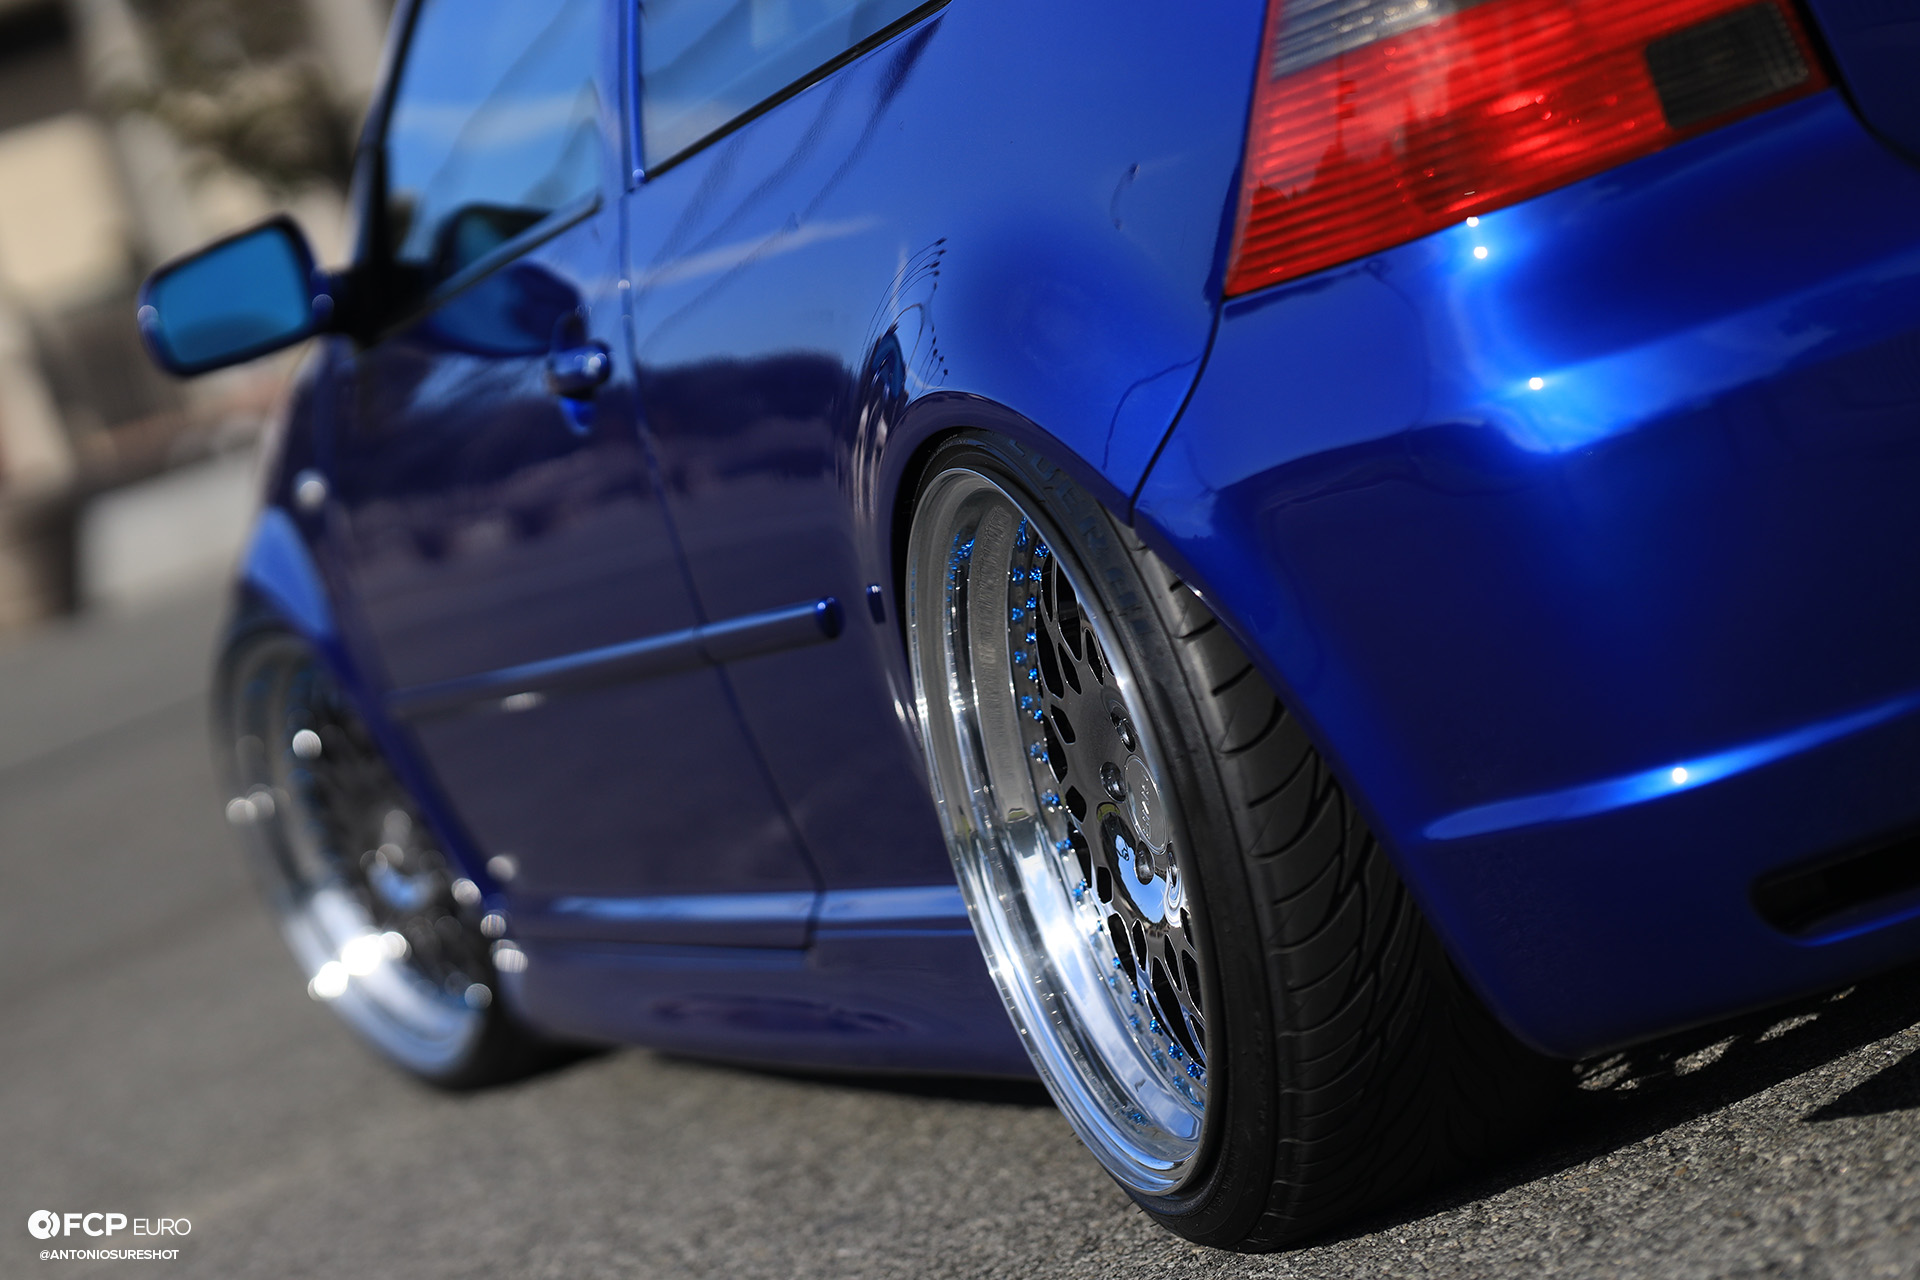 MK4 Volkswagen Golf R32 Deep Blue Pearl Air Ride Wheels